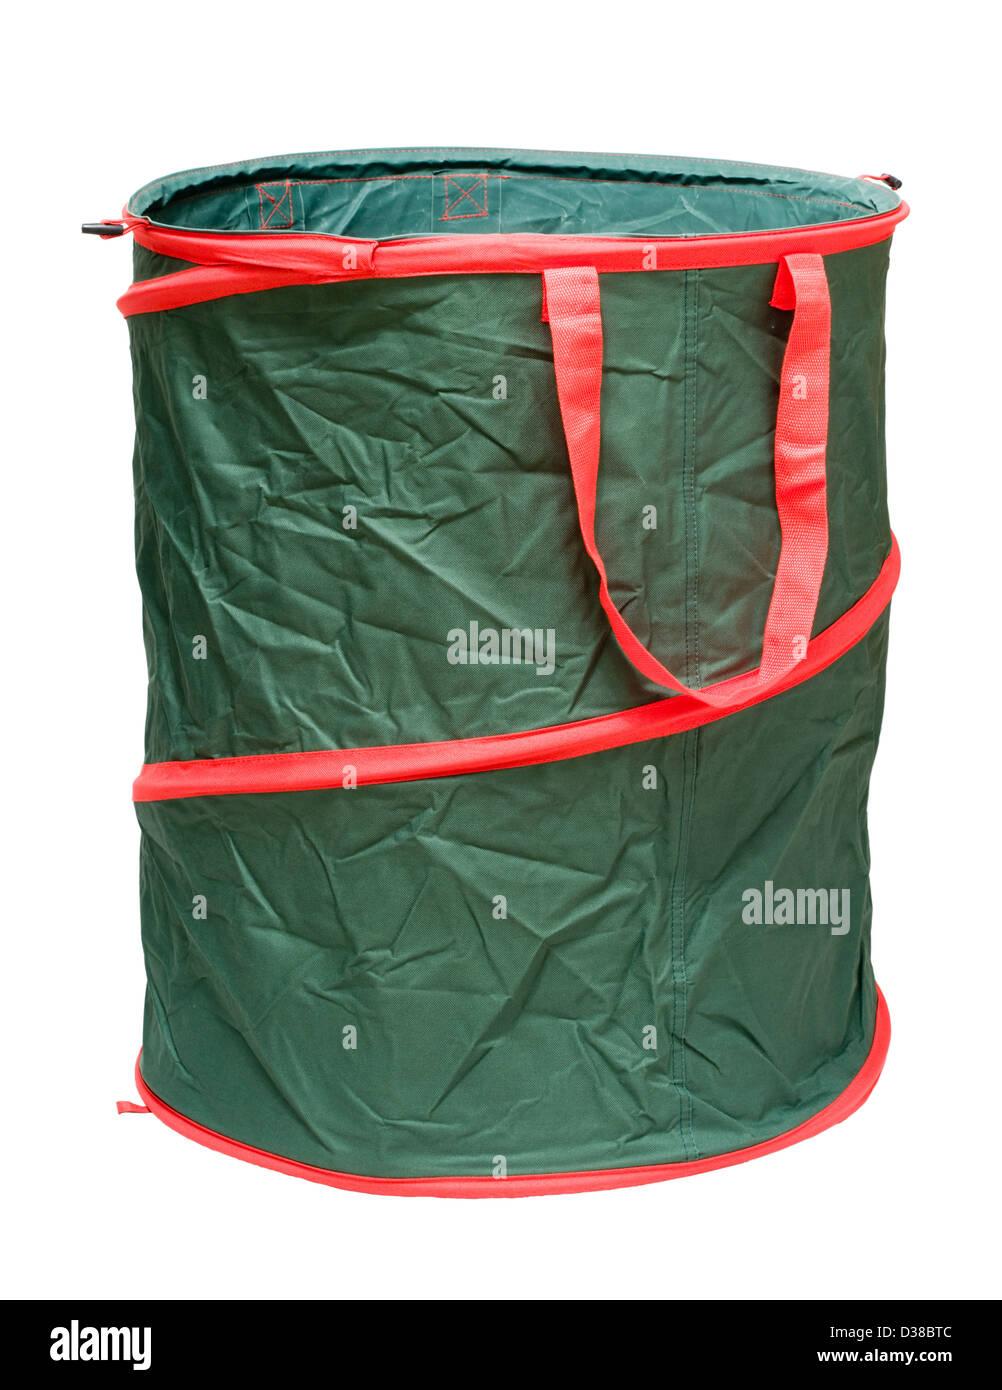 Collapsible garden tidy bin. - Stock Image